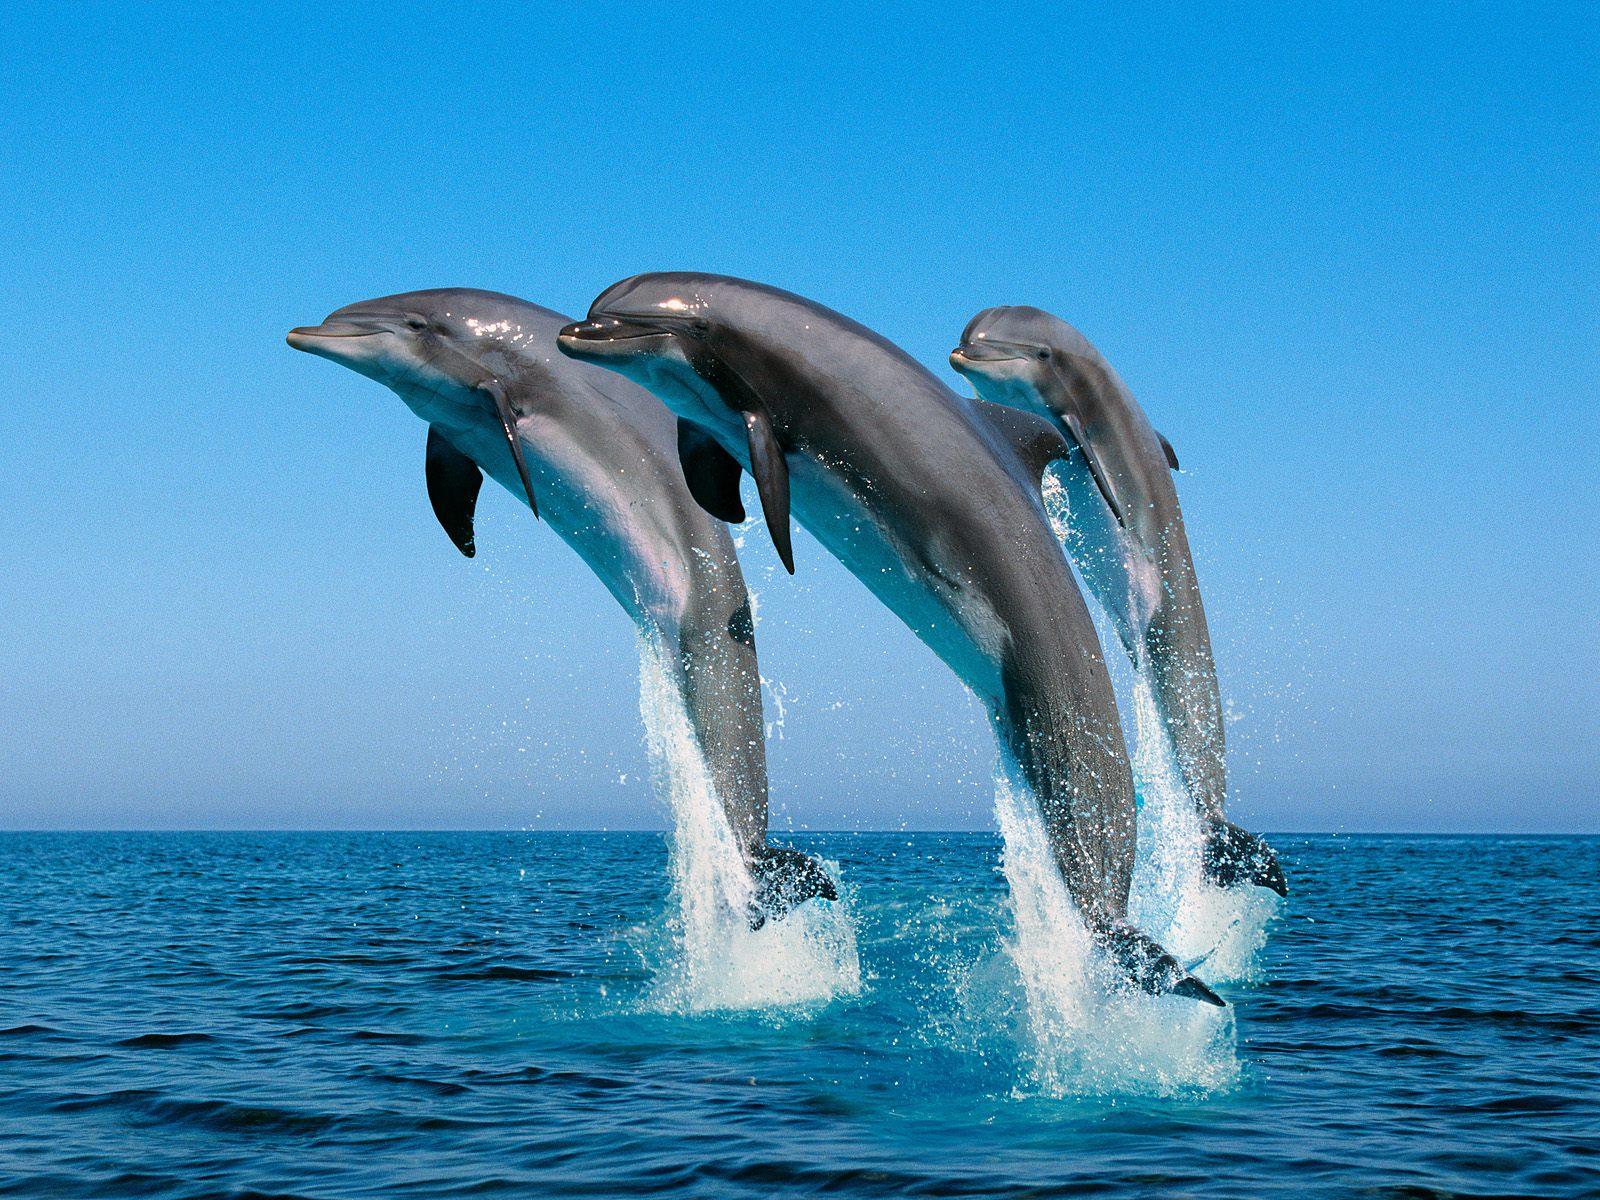 hd dolphin wallpaper hd dolphin wallpaper hd dolphin wallpaper hd 1600x1200